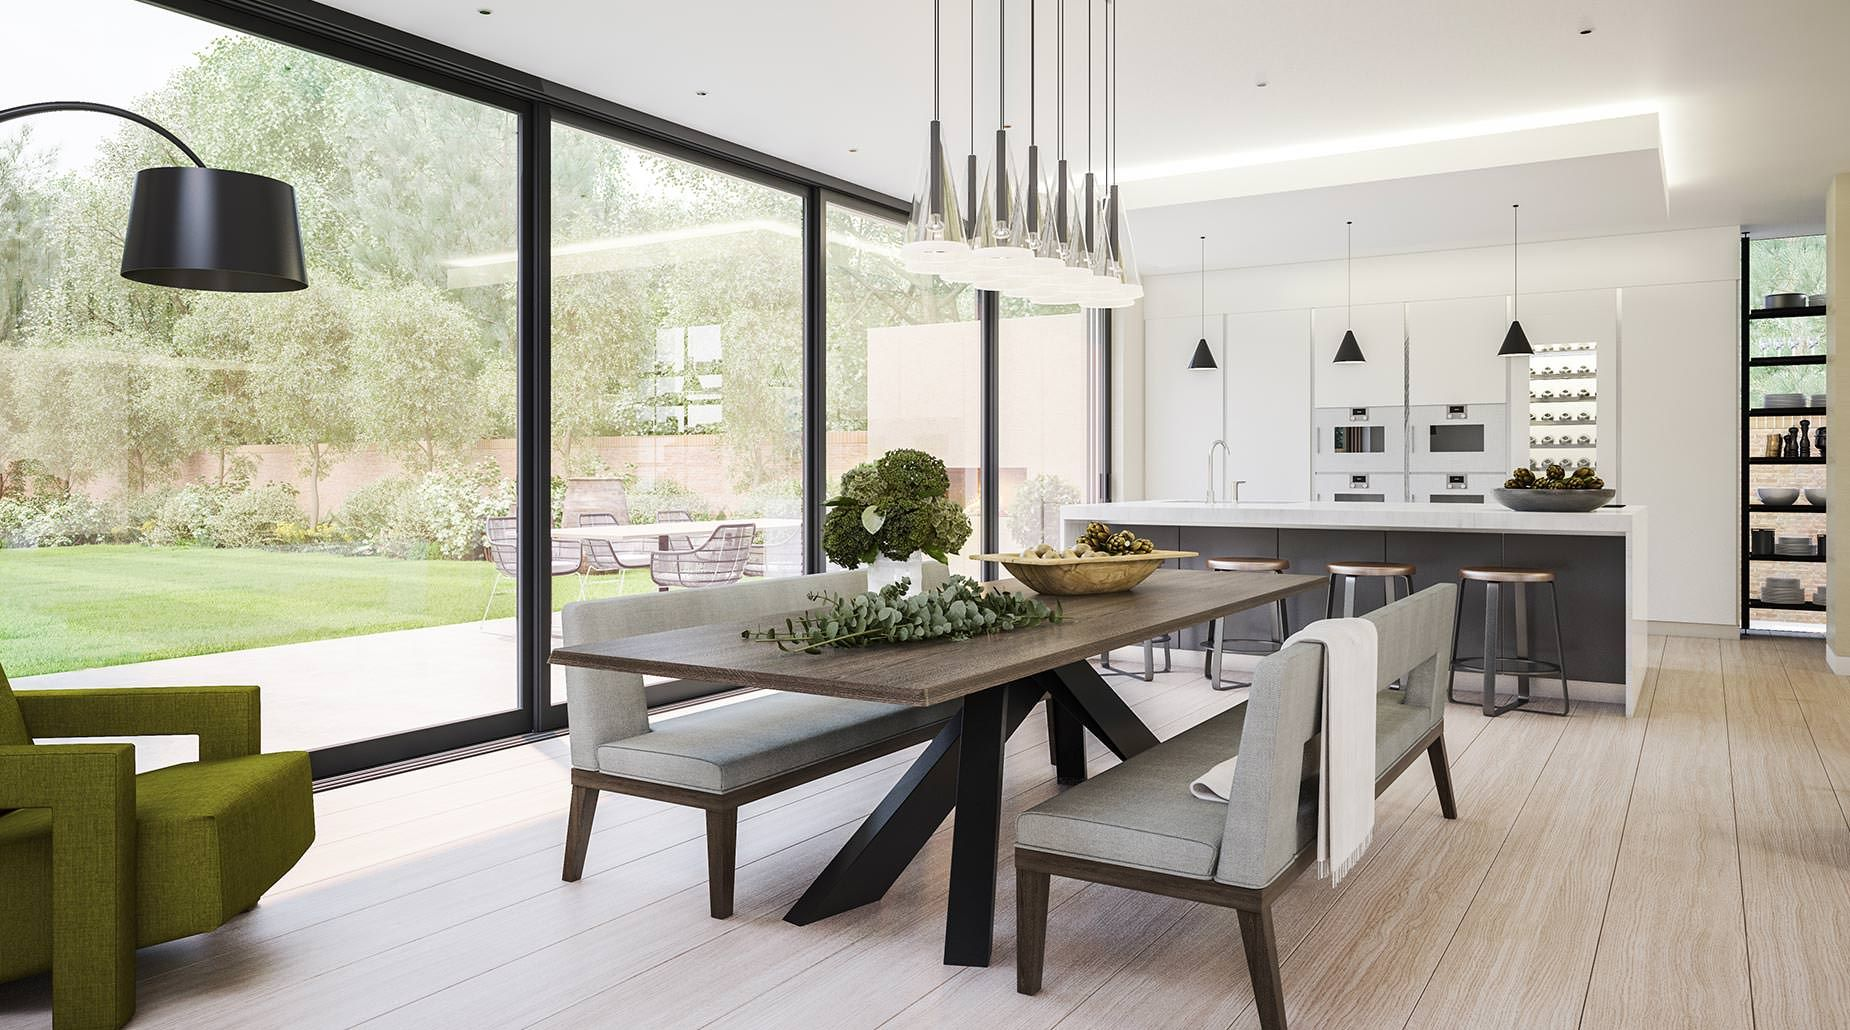 Expert North Carolina Interior Design and Build Services - 919 North ...